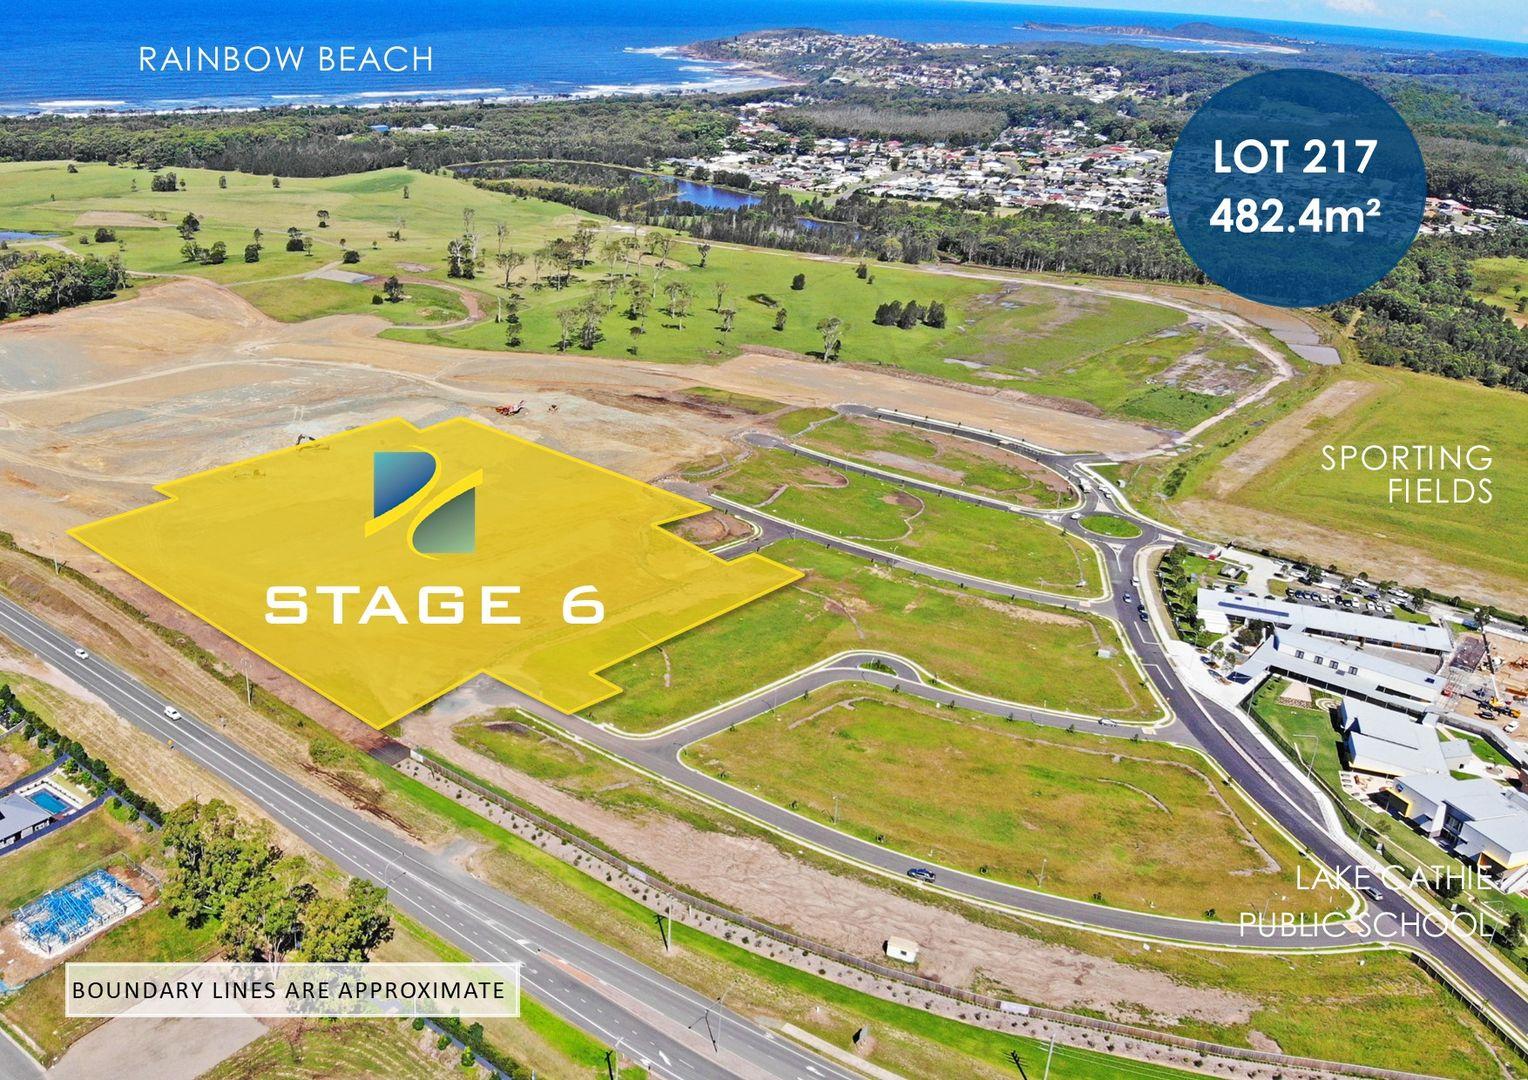 Lot 217 - Rainbow Beach Estate, Lake Cathie NSW 2445, Image 0